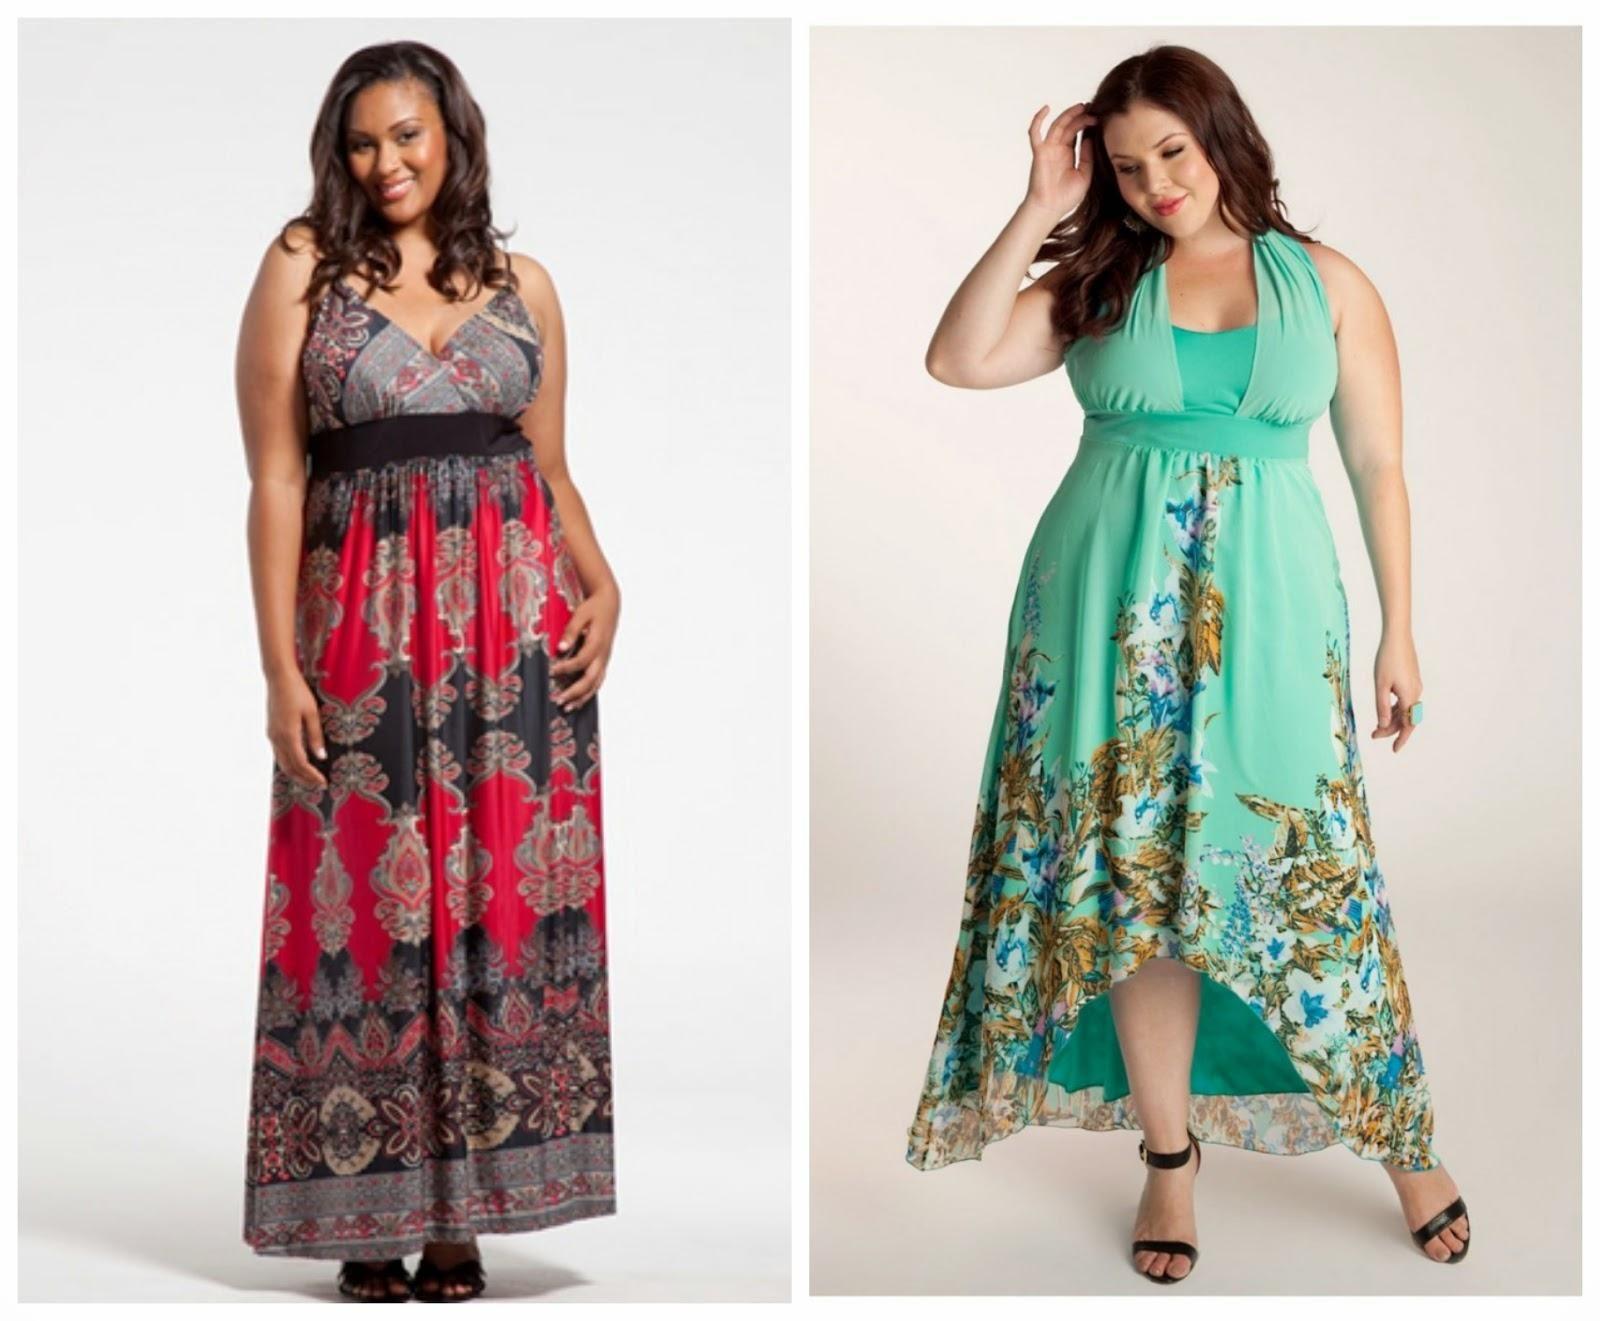 ca3255a61 blusas moderna para mujer gordita - Buscar con Google | ropa moderna ...